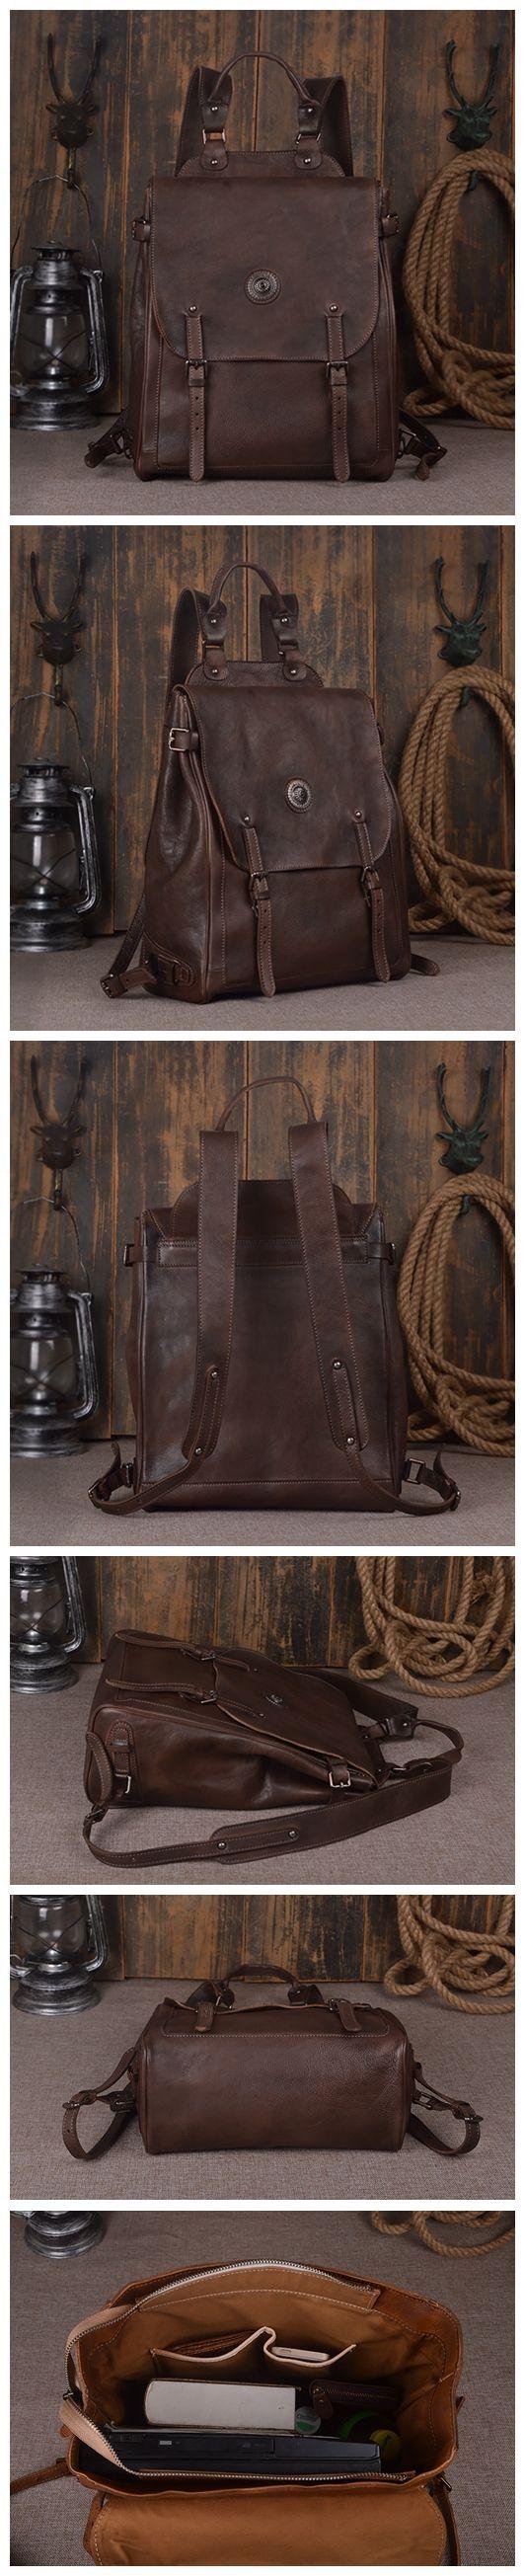 Laptop bags korea - Leather Backpack Laptop Backpack Laptop Bags 9036